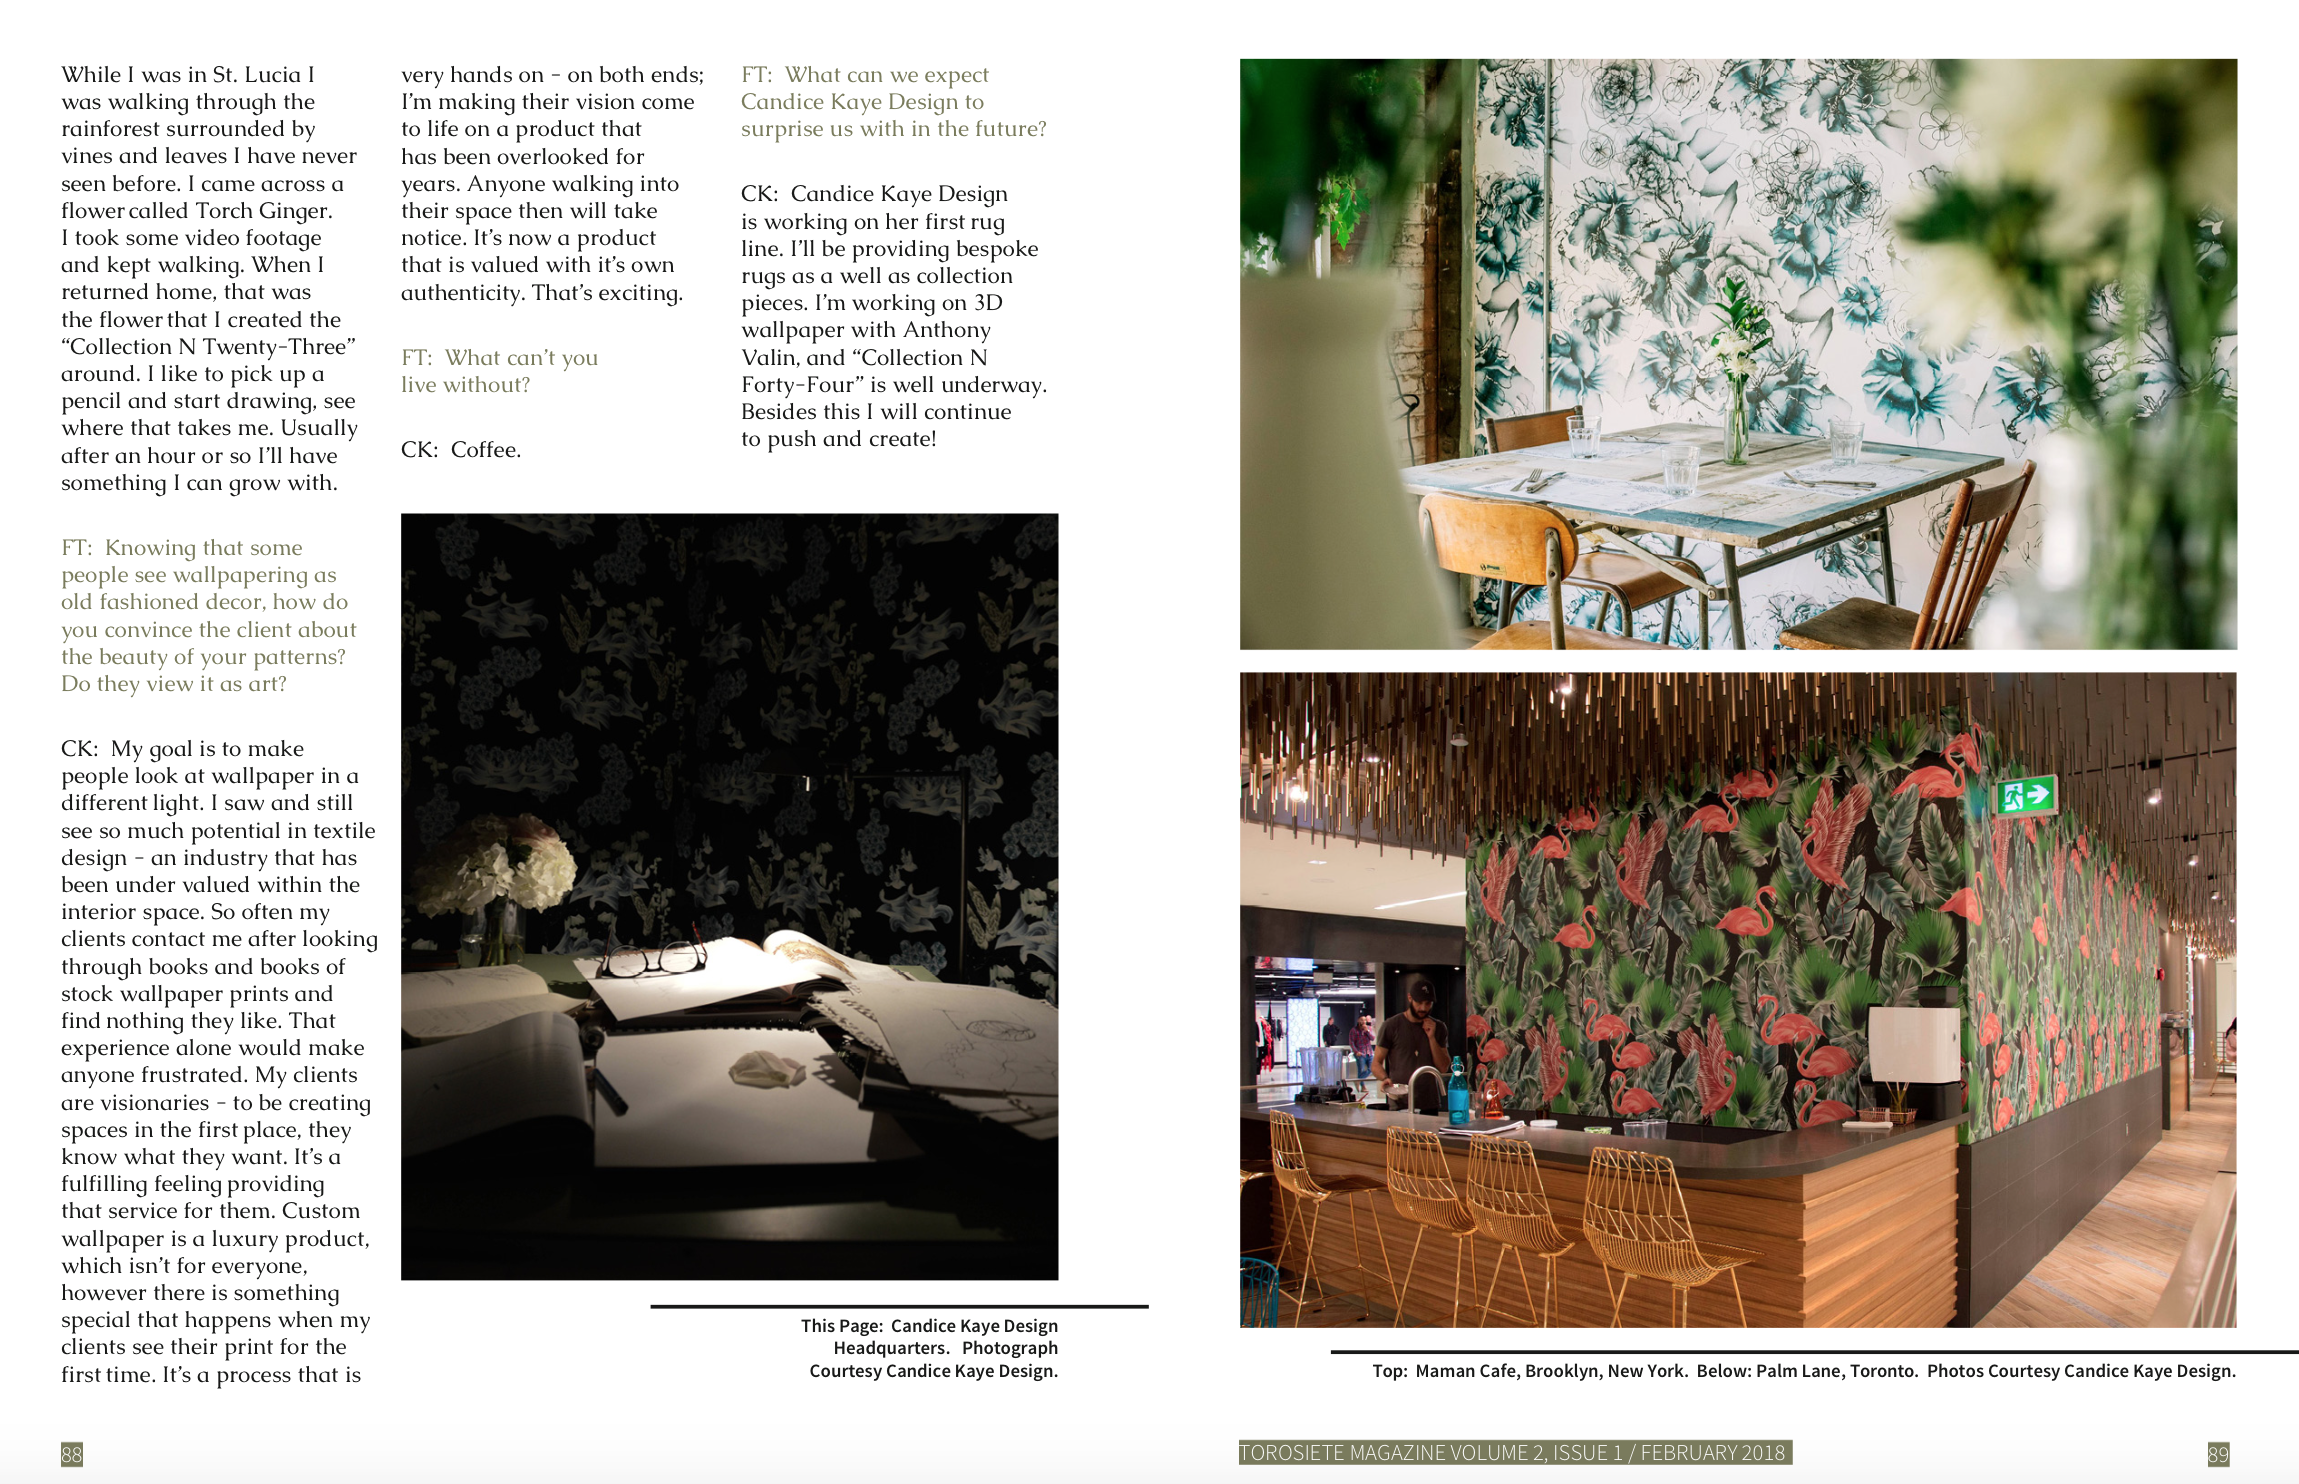 TorosietteMagazine_CandiceKayeDesign_Page4.png